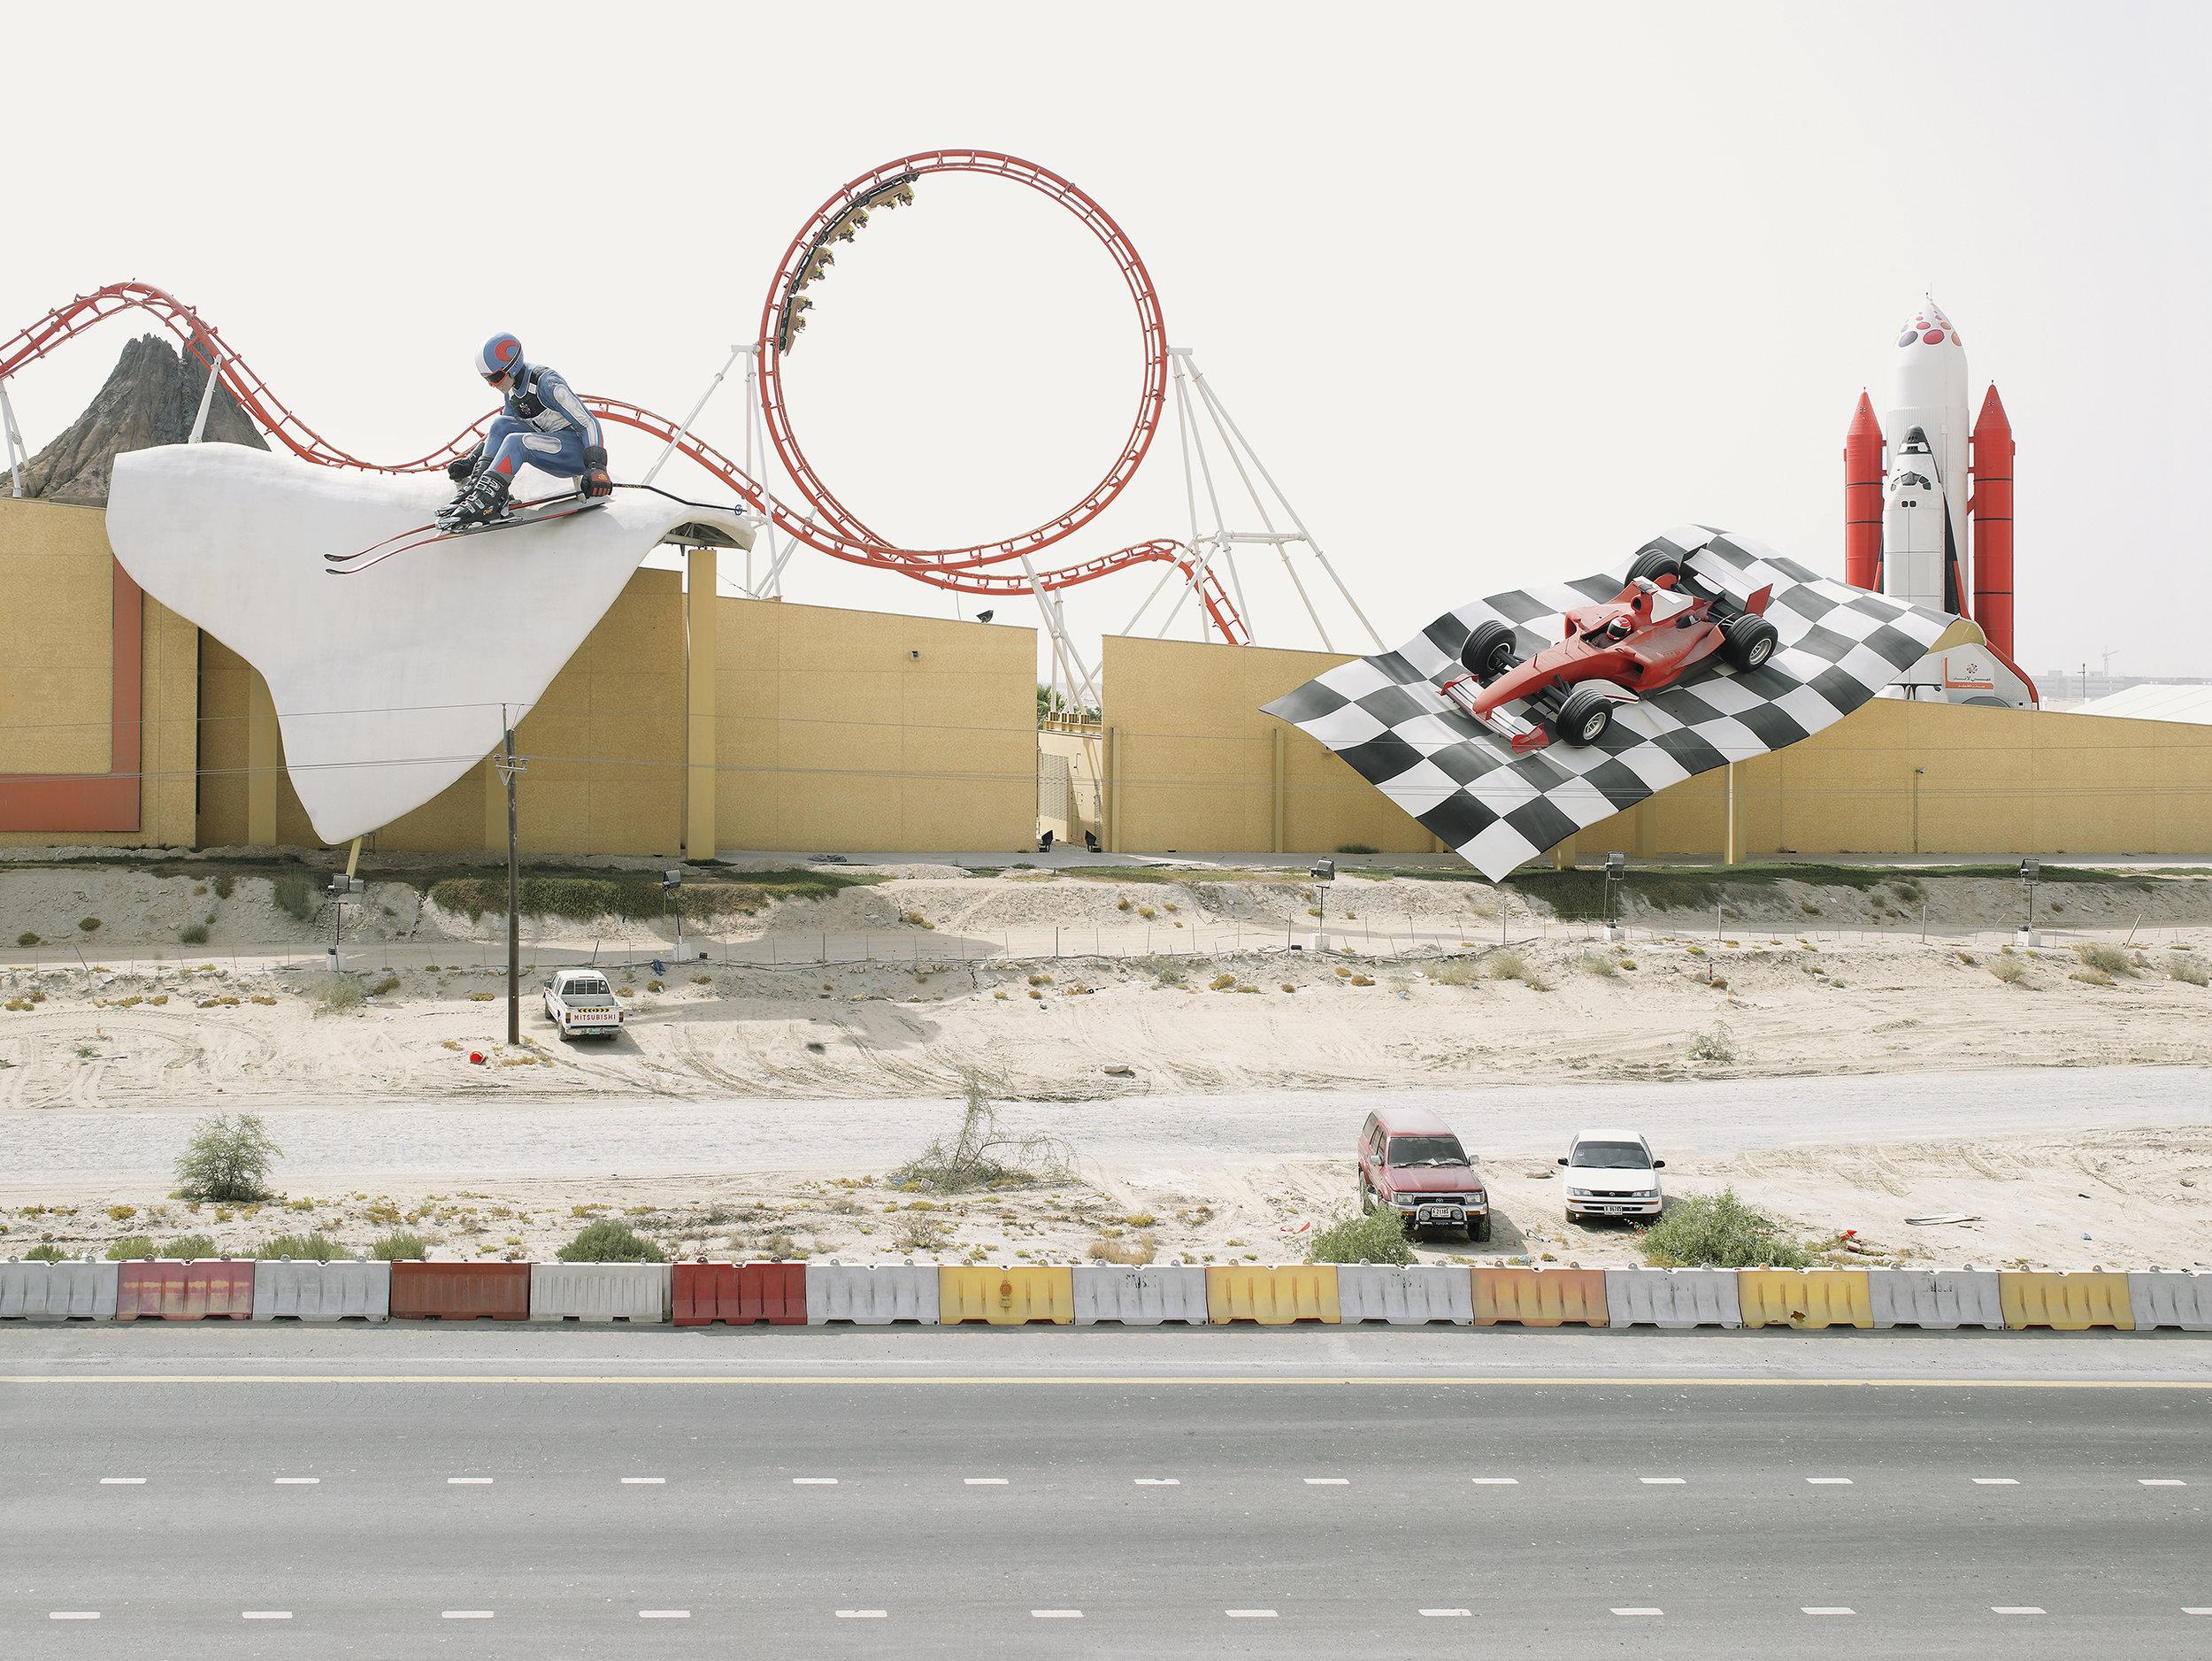 Billboards for Dubailand, United Arab Emirates, 2008.